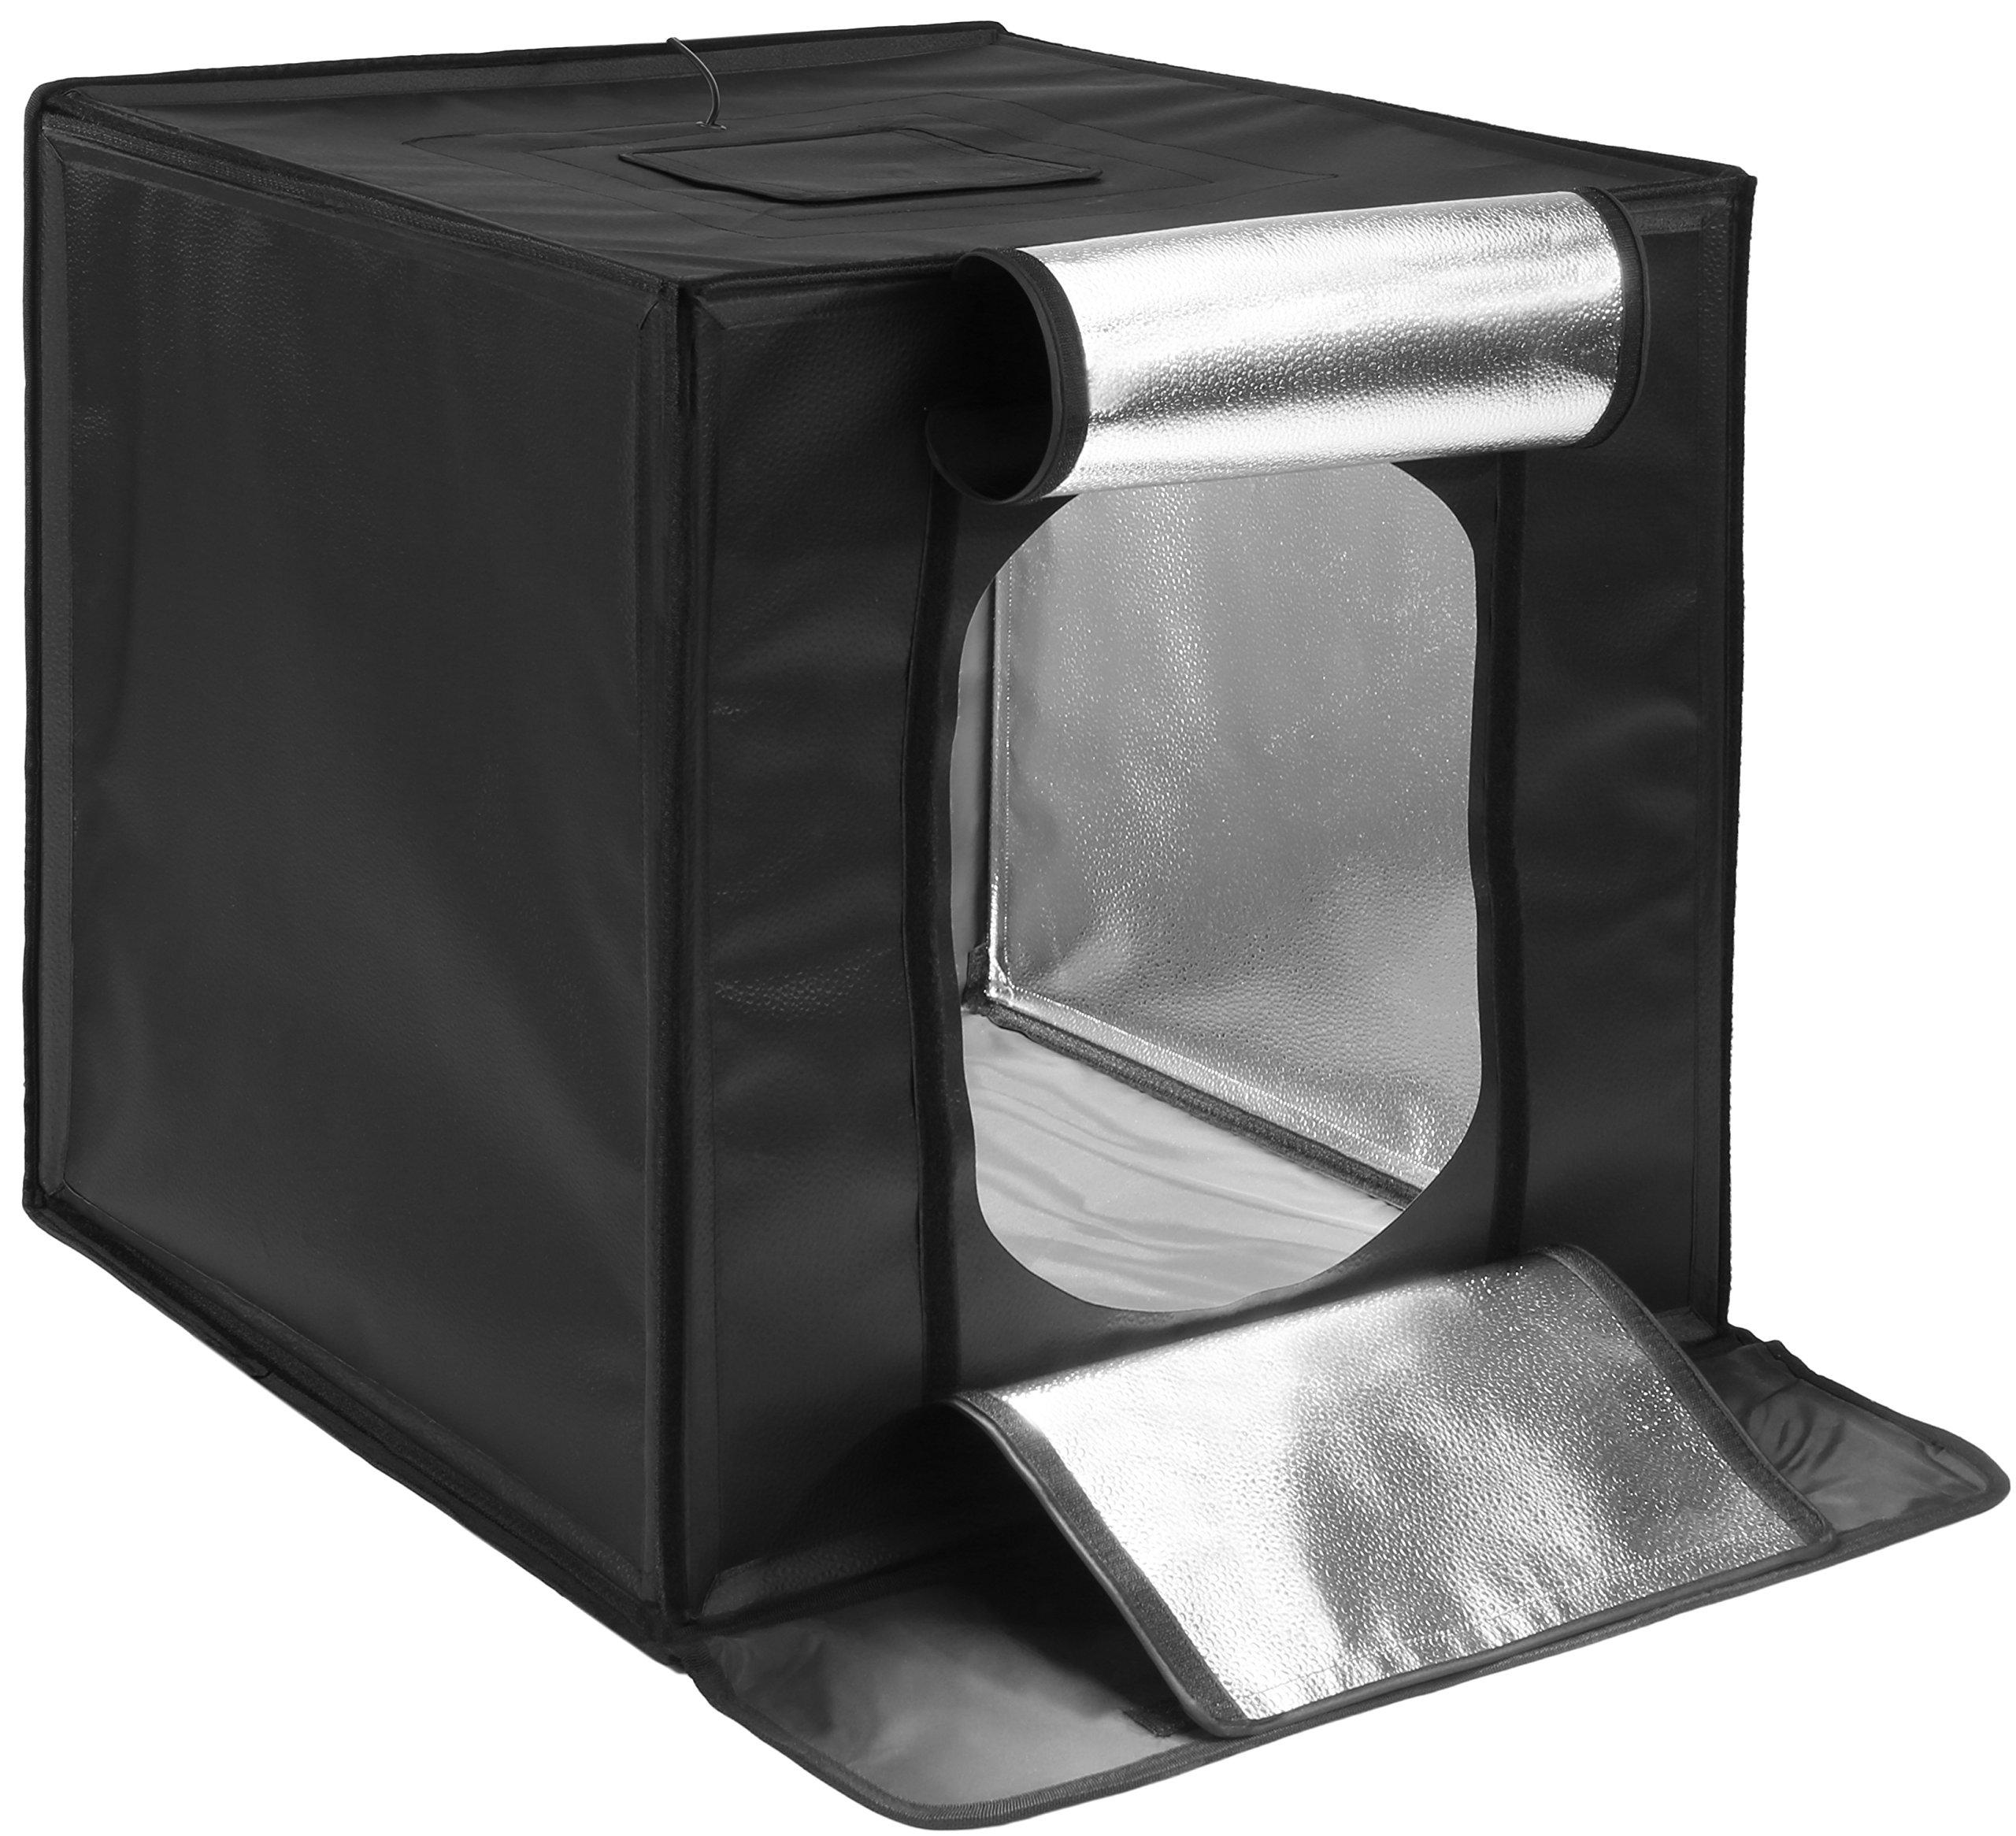 Angler Port-a-Cube LED Light Tent